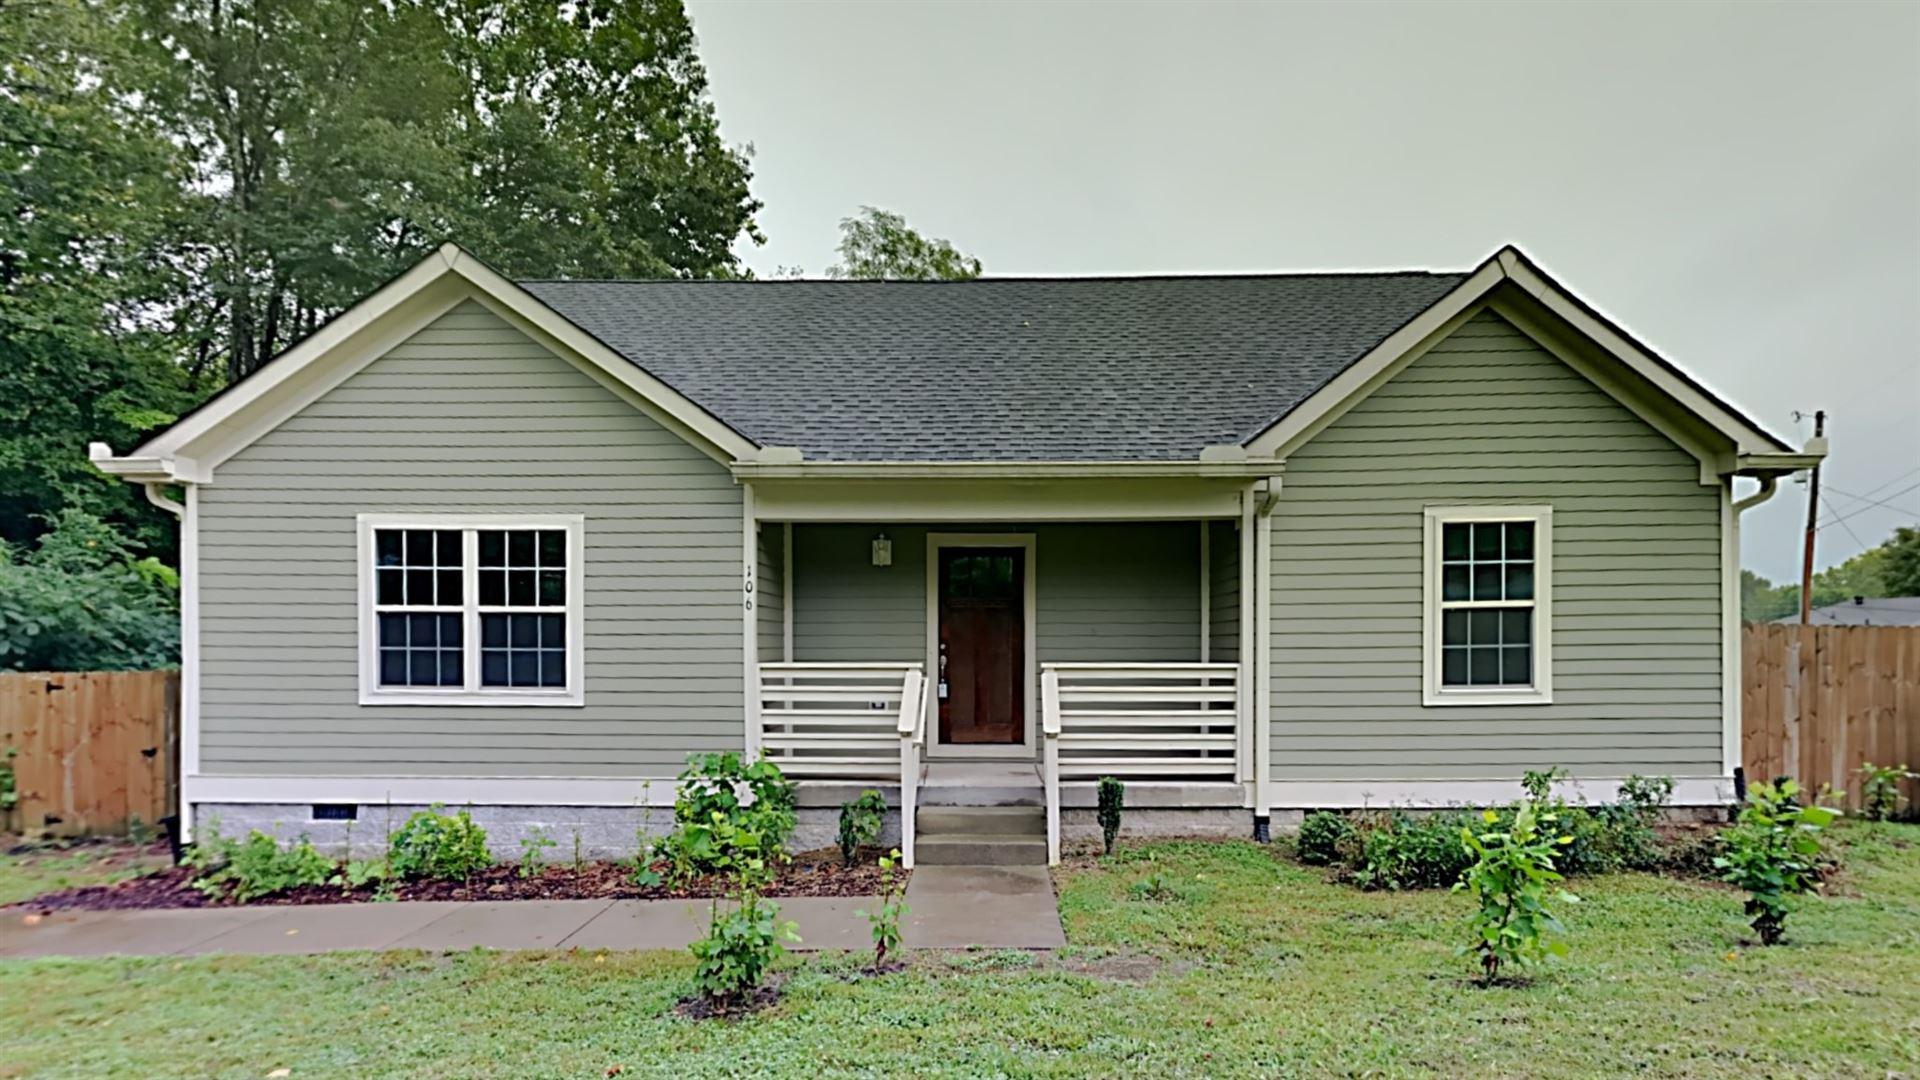 106 Helen St, Ashland City, TN 37015 - MLS#: 2287121